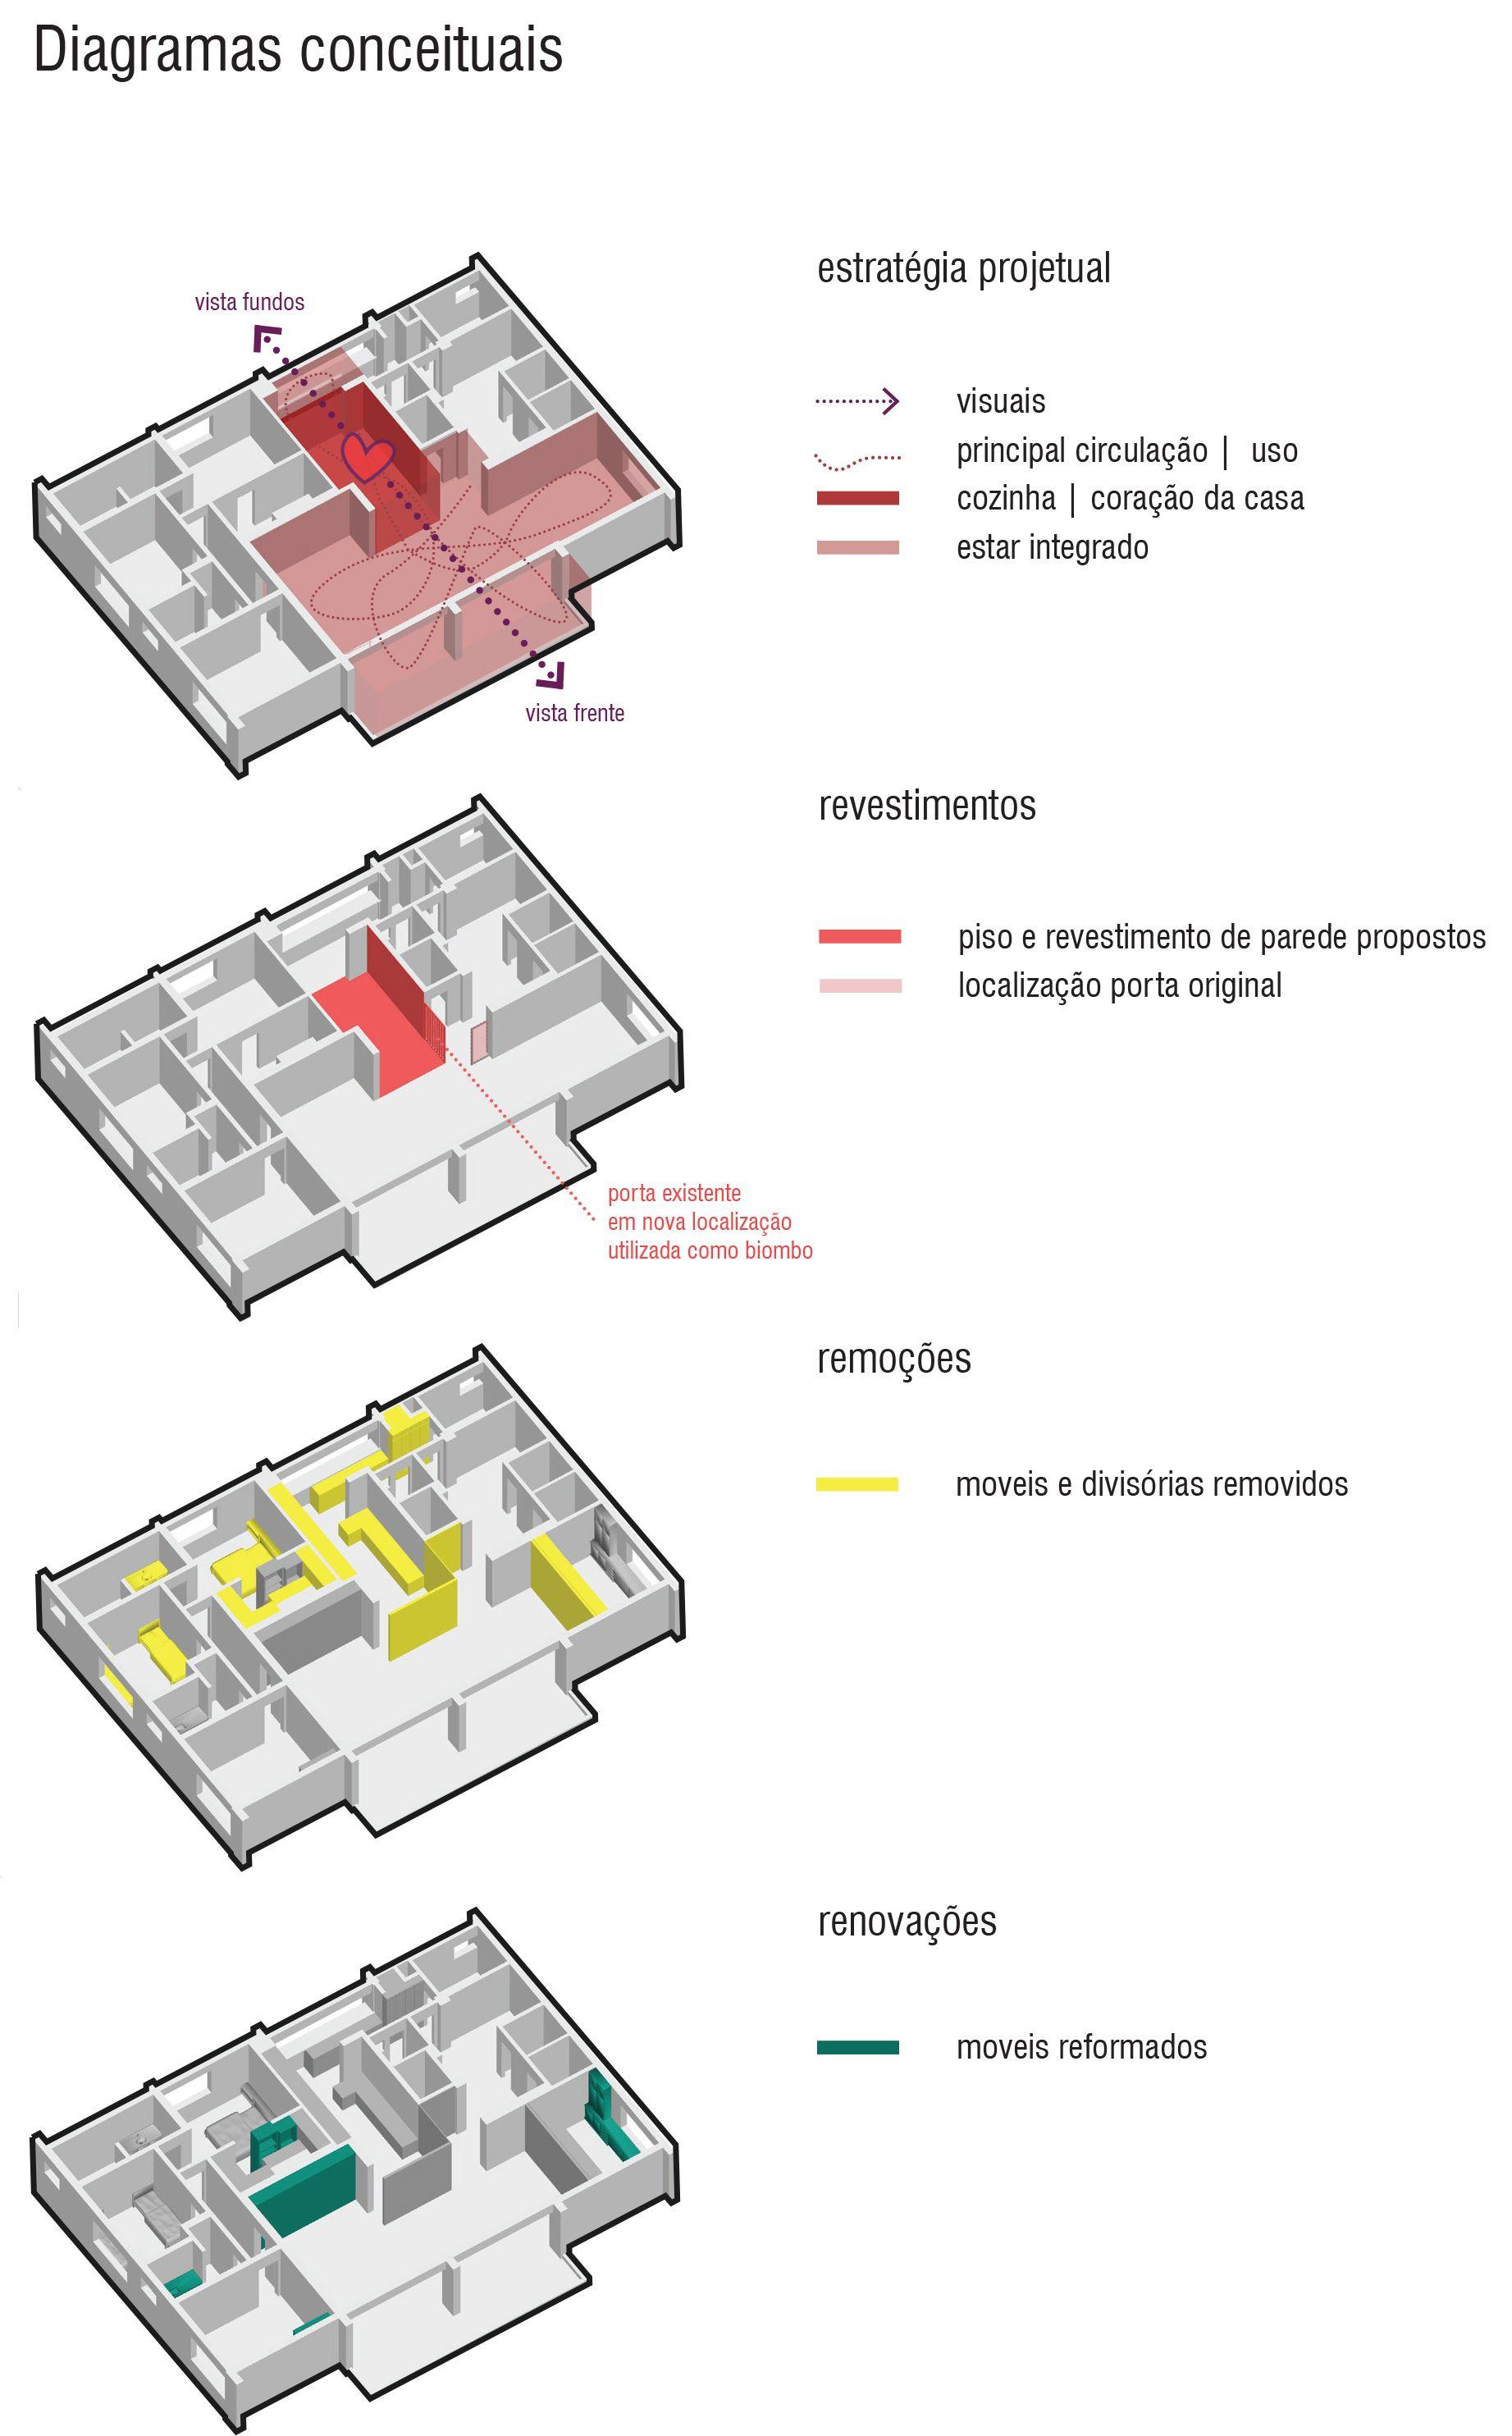 raid 5 concept with diagram ear worksheet galeria de apartamento chaves illa 23 arch